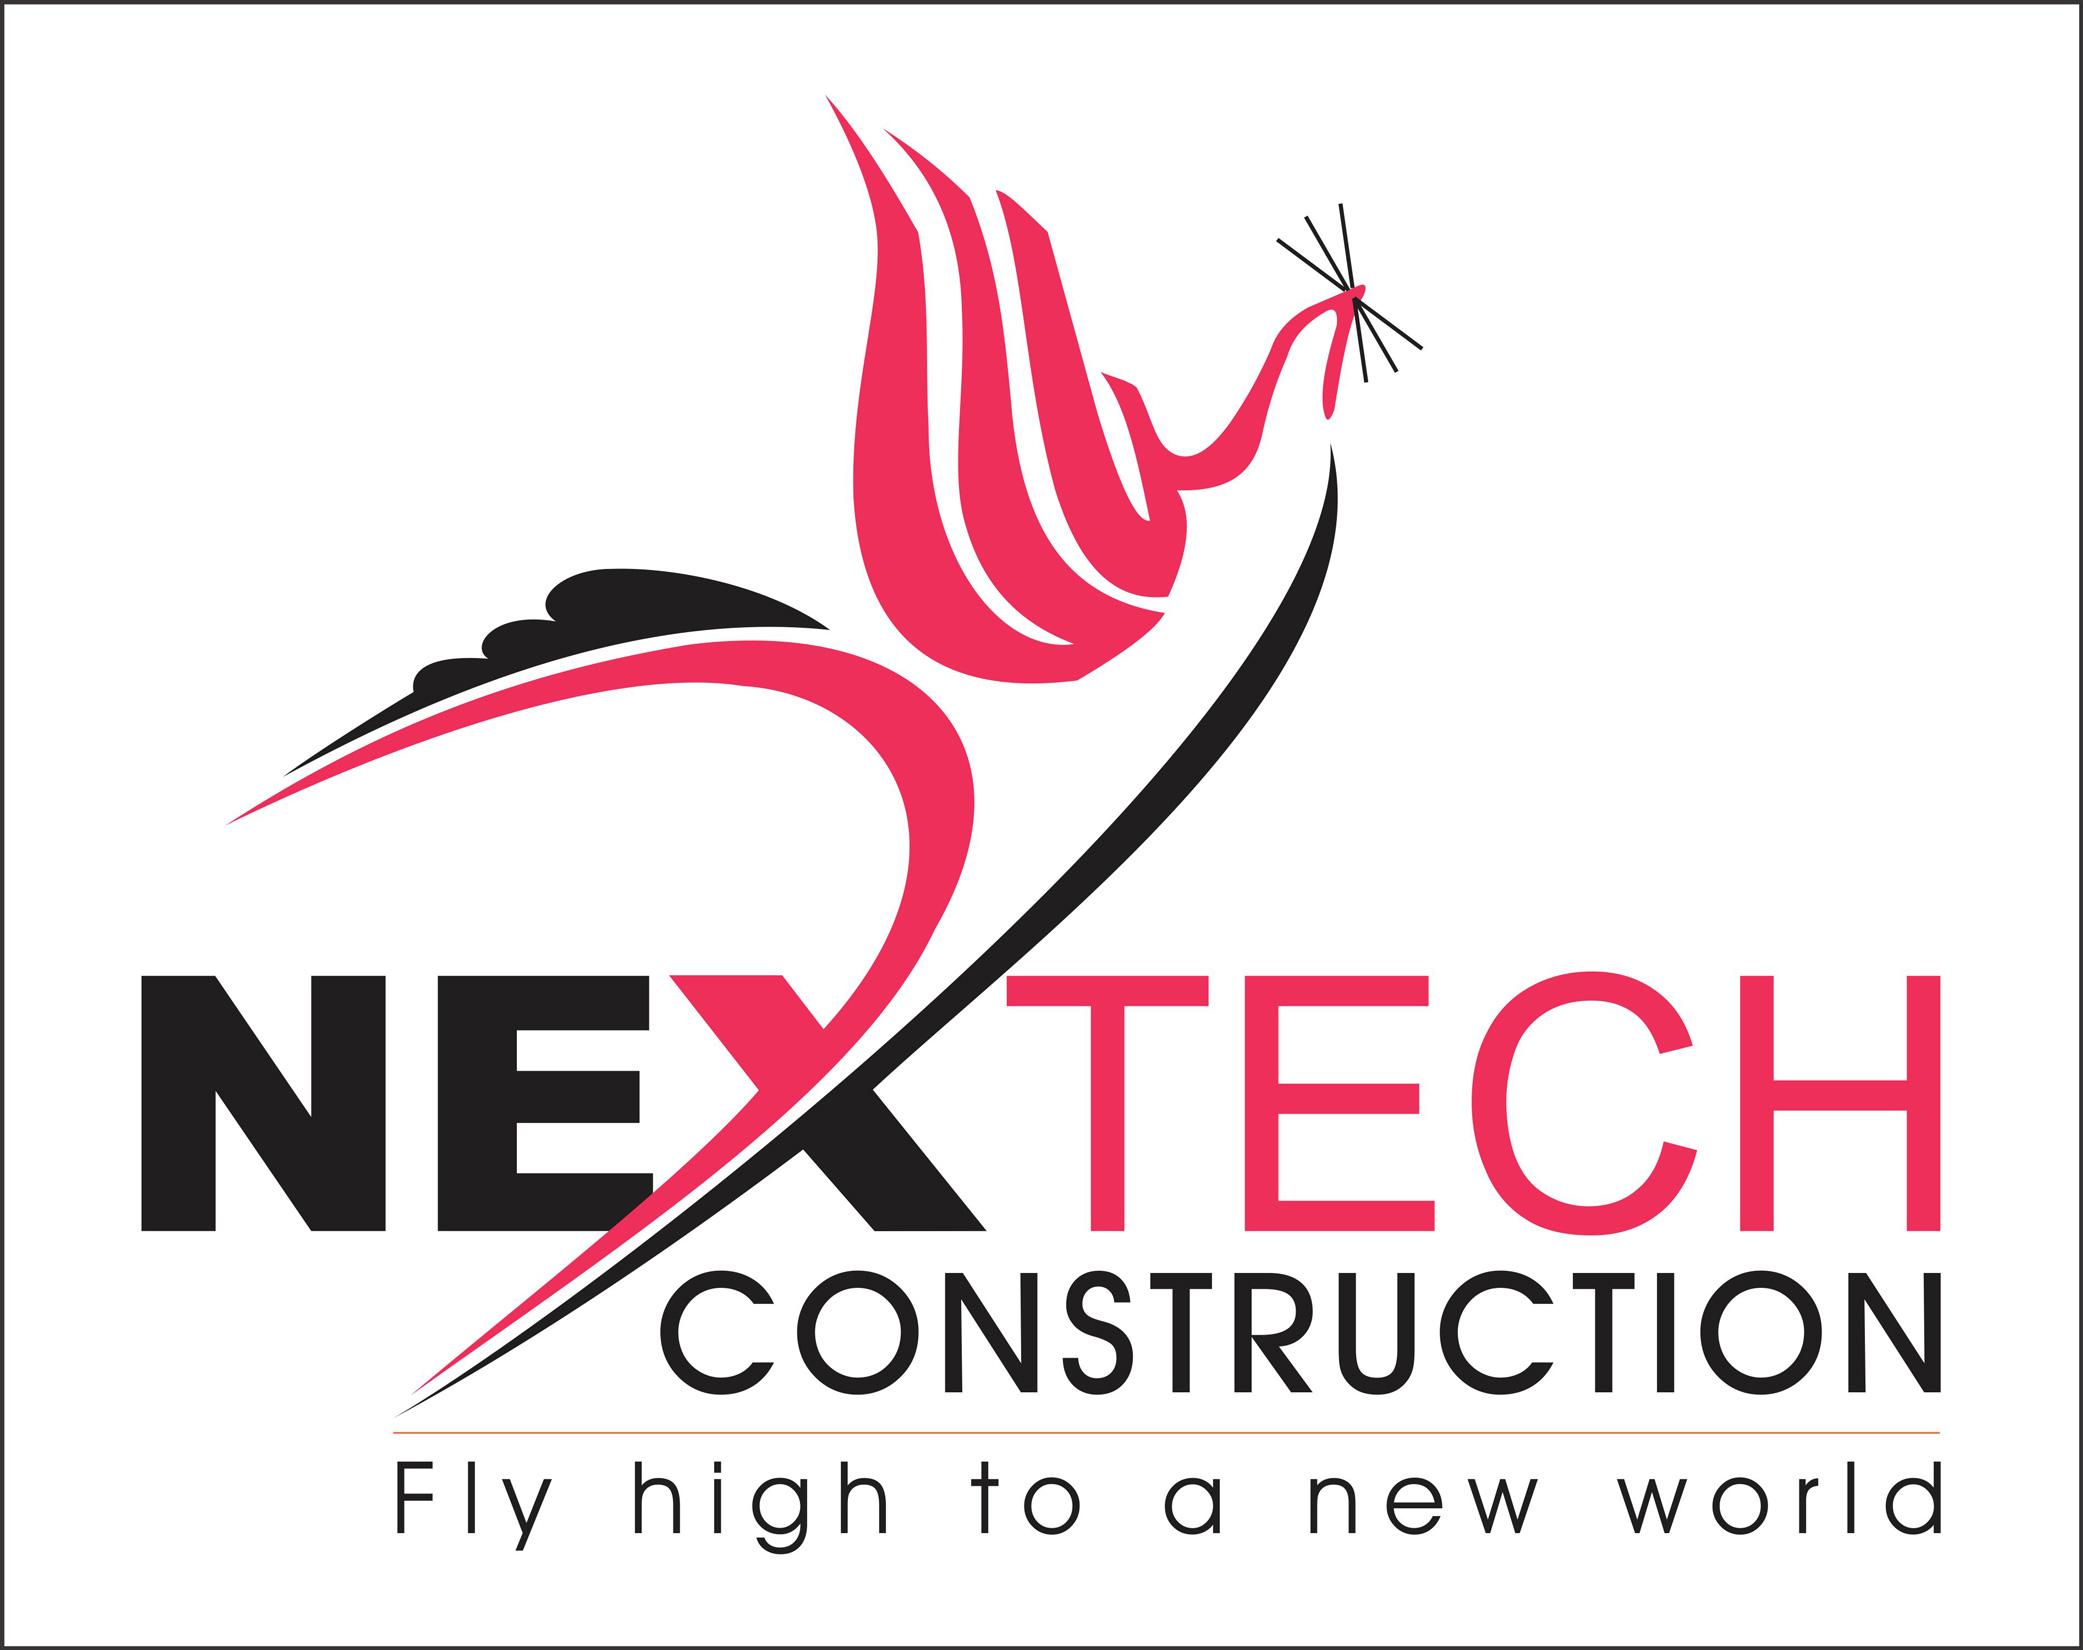 nextech-construction-logo-graphic-design